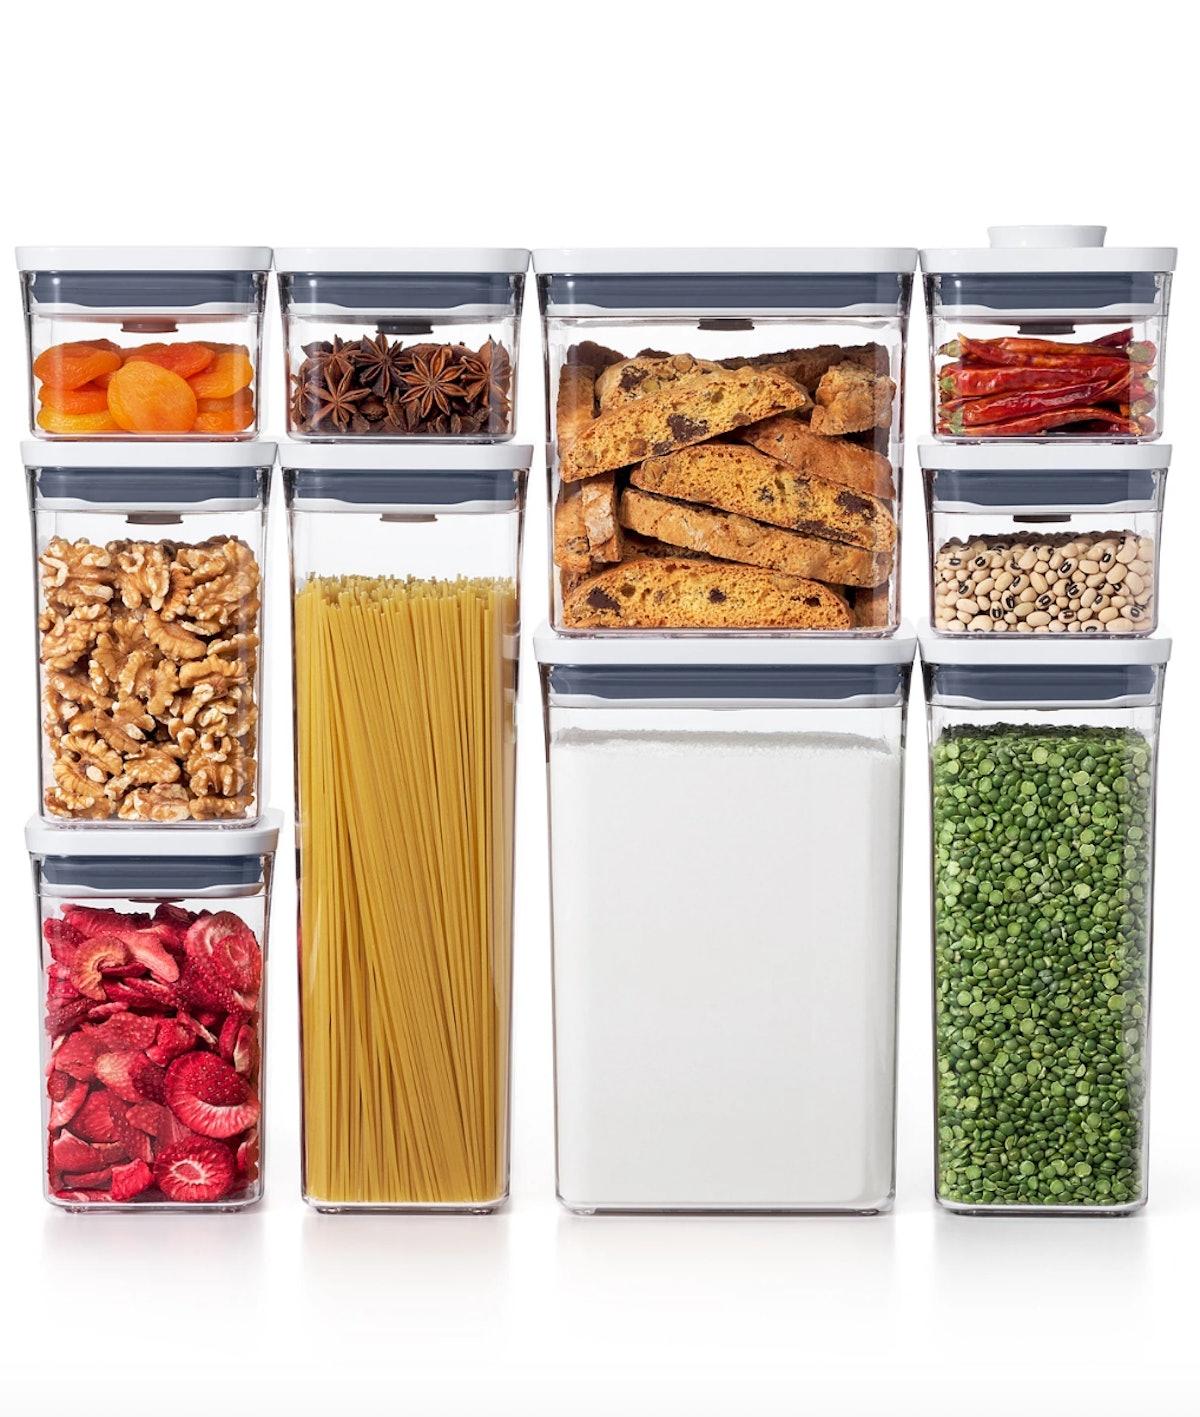 Pop 10-Pc. Food Storage Container Set